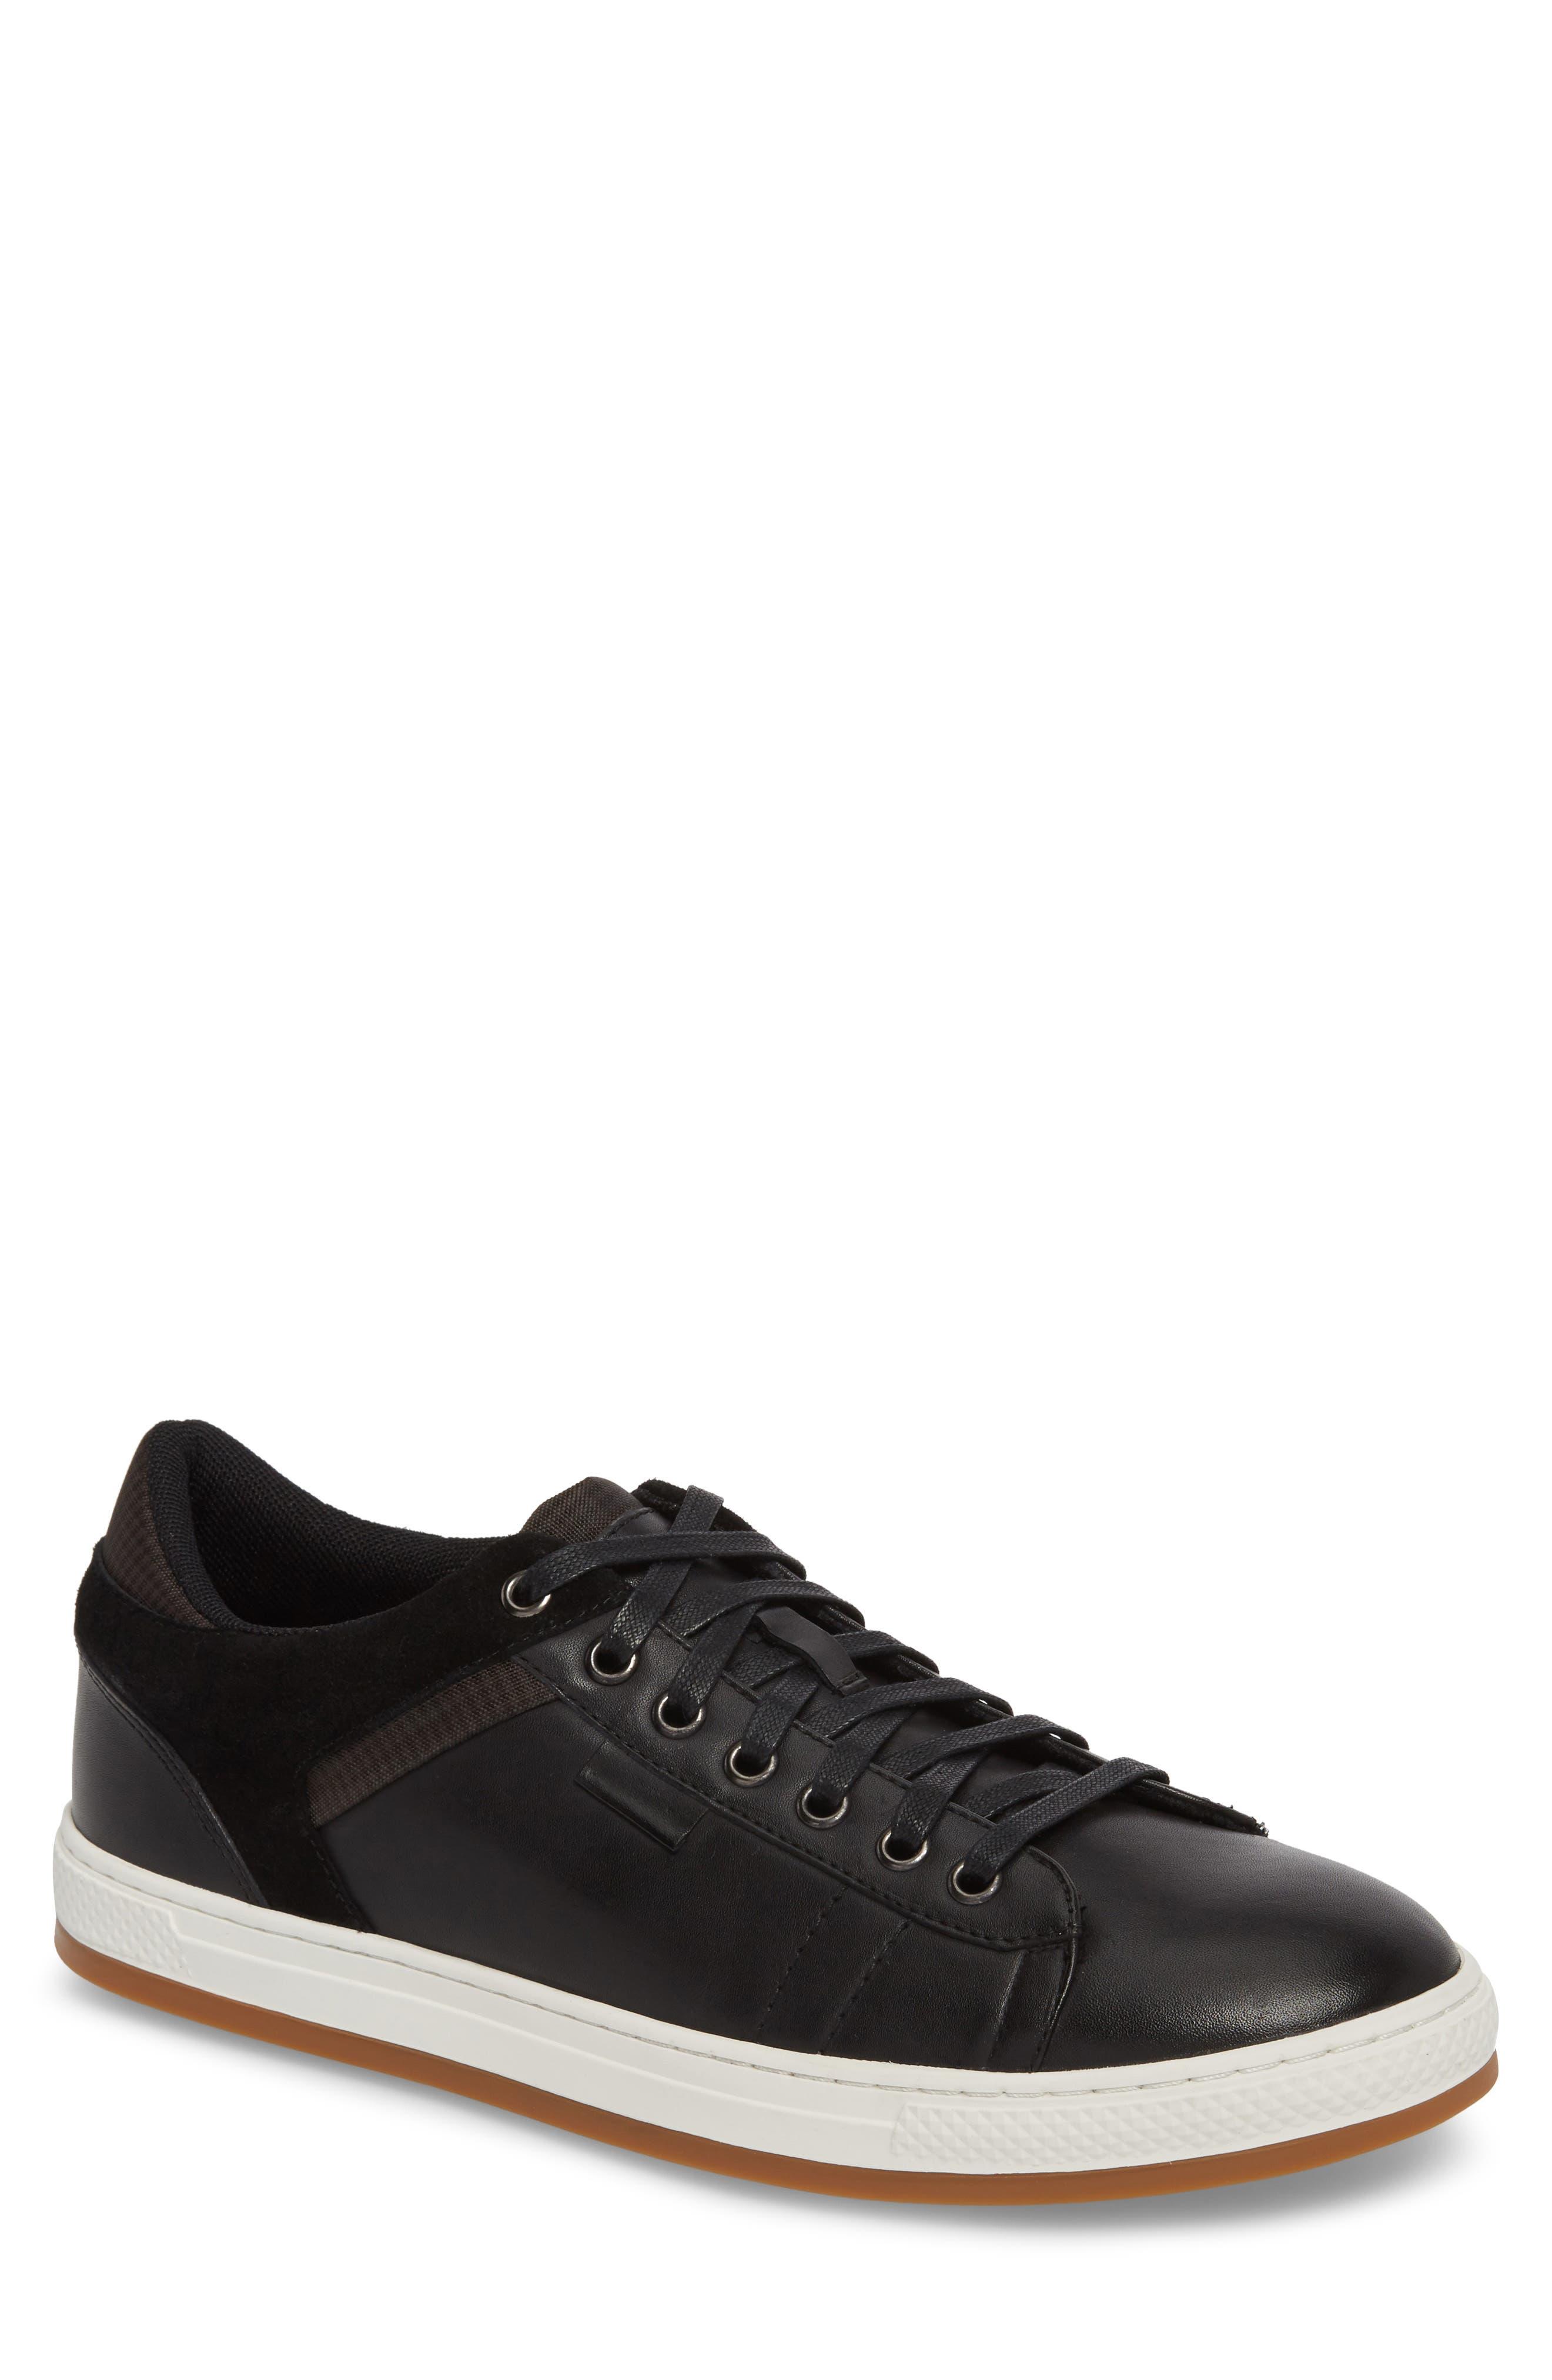 Ireton Low Top Sneaker,                         Main,                         color, BLACK LEATHER/ SUEDE